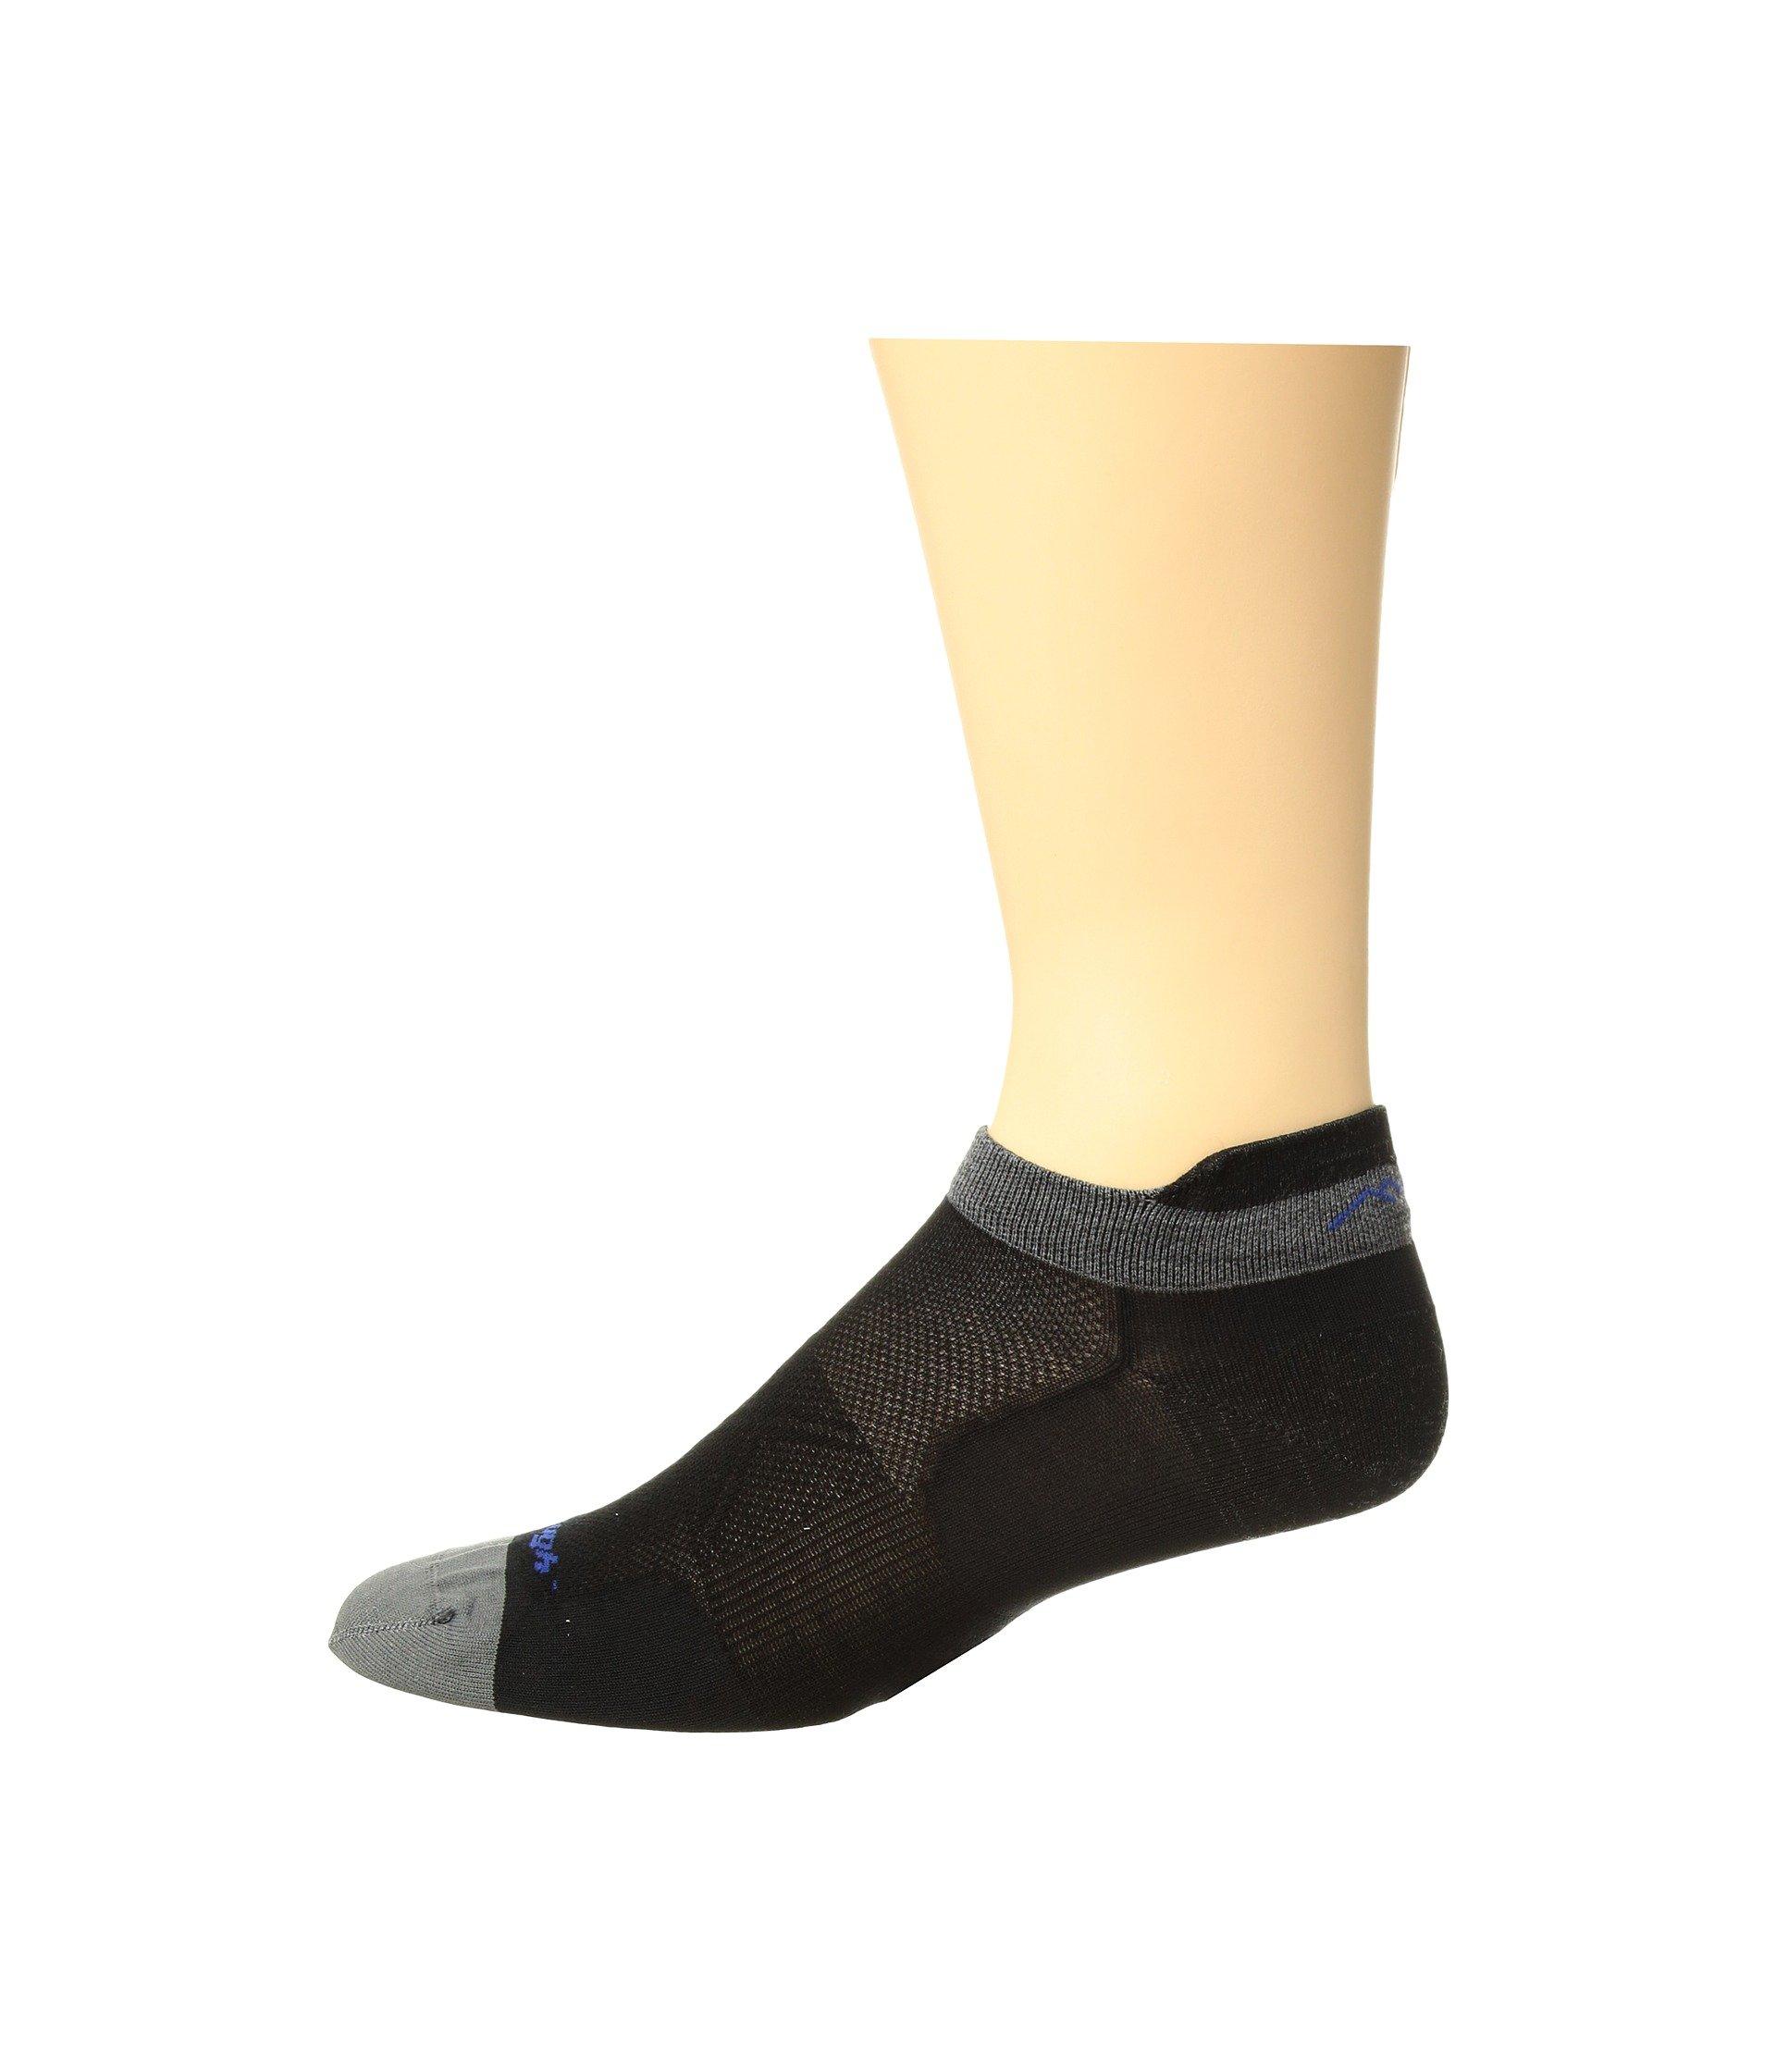 Tough No Tab Socks Vertex Black Show Vermont Darn Ultra Light wdqH46wT